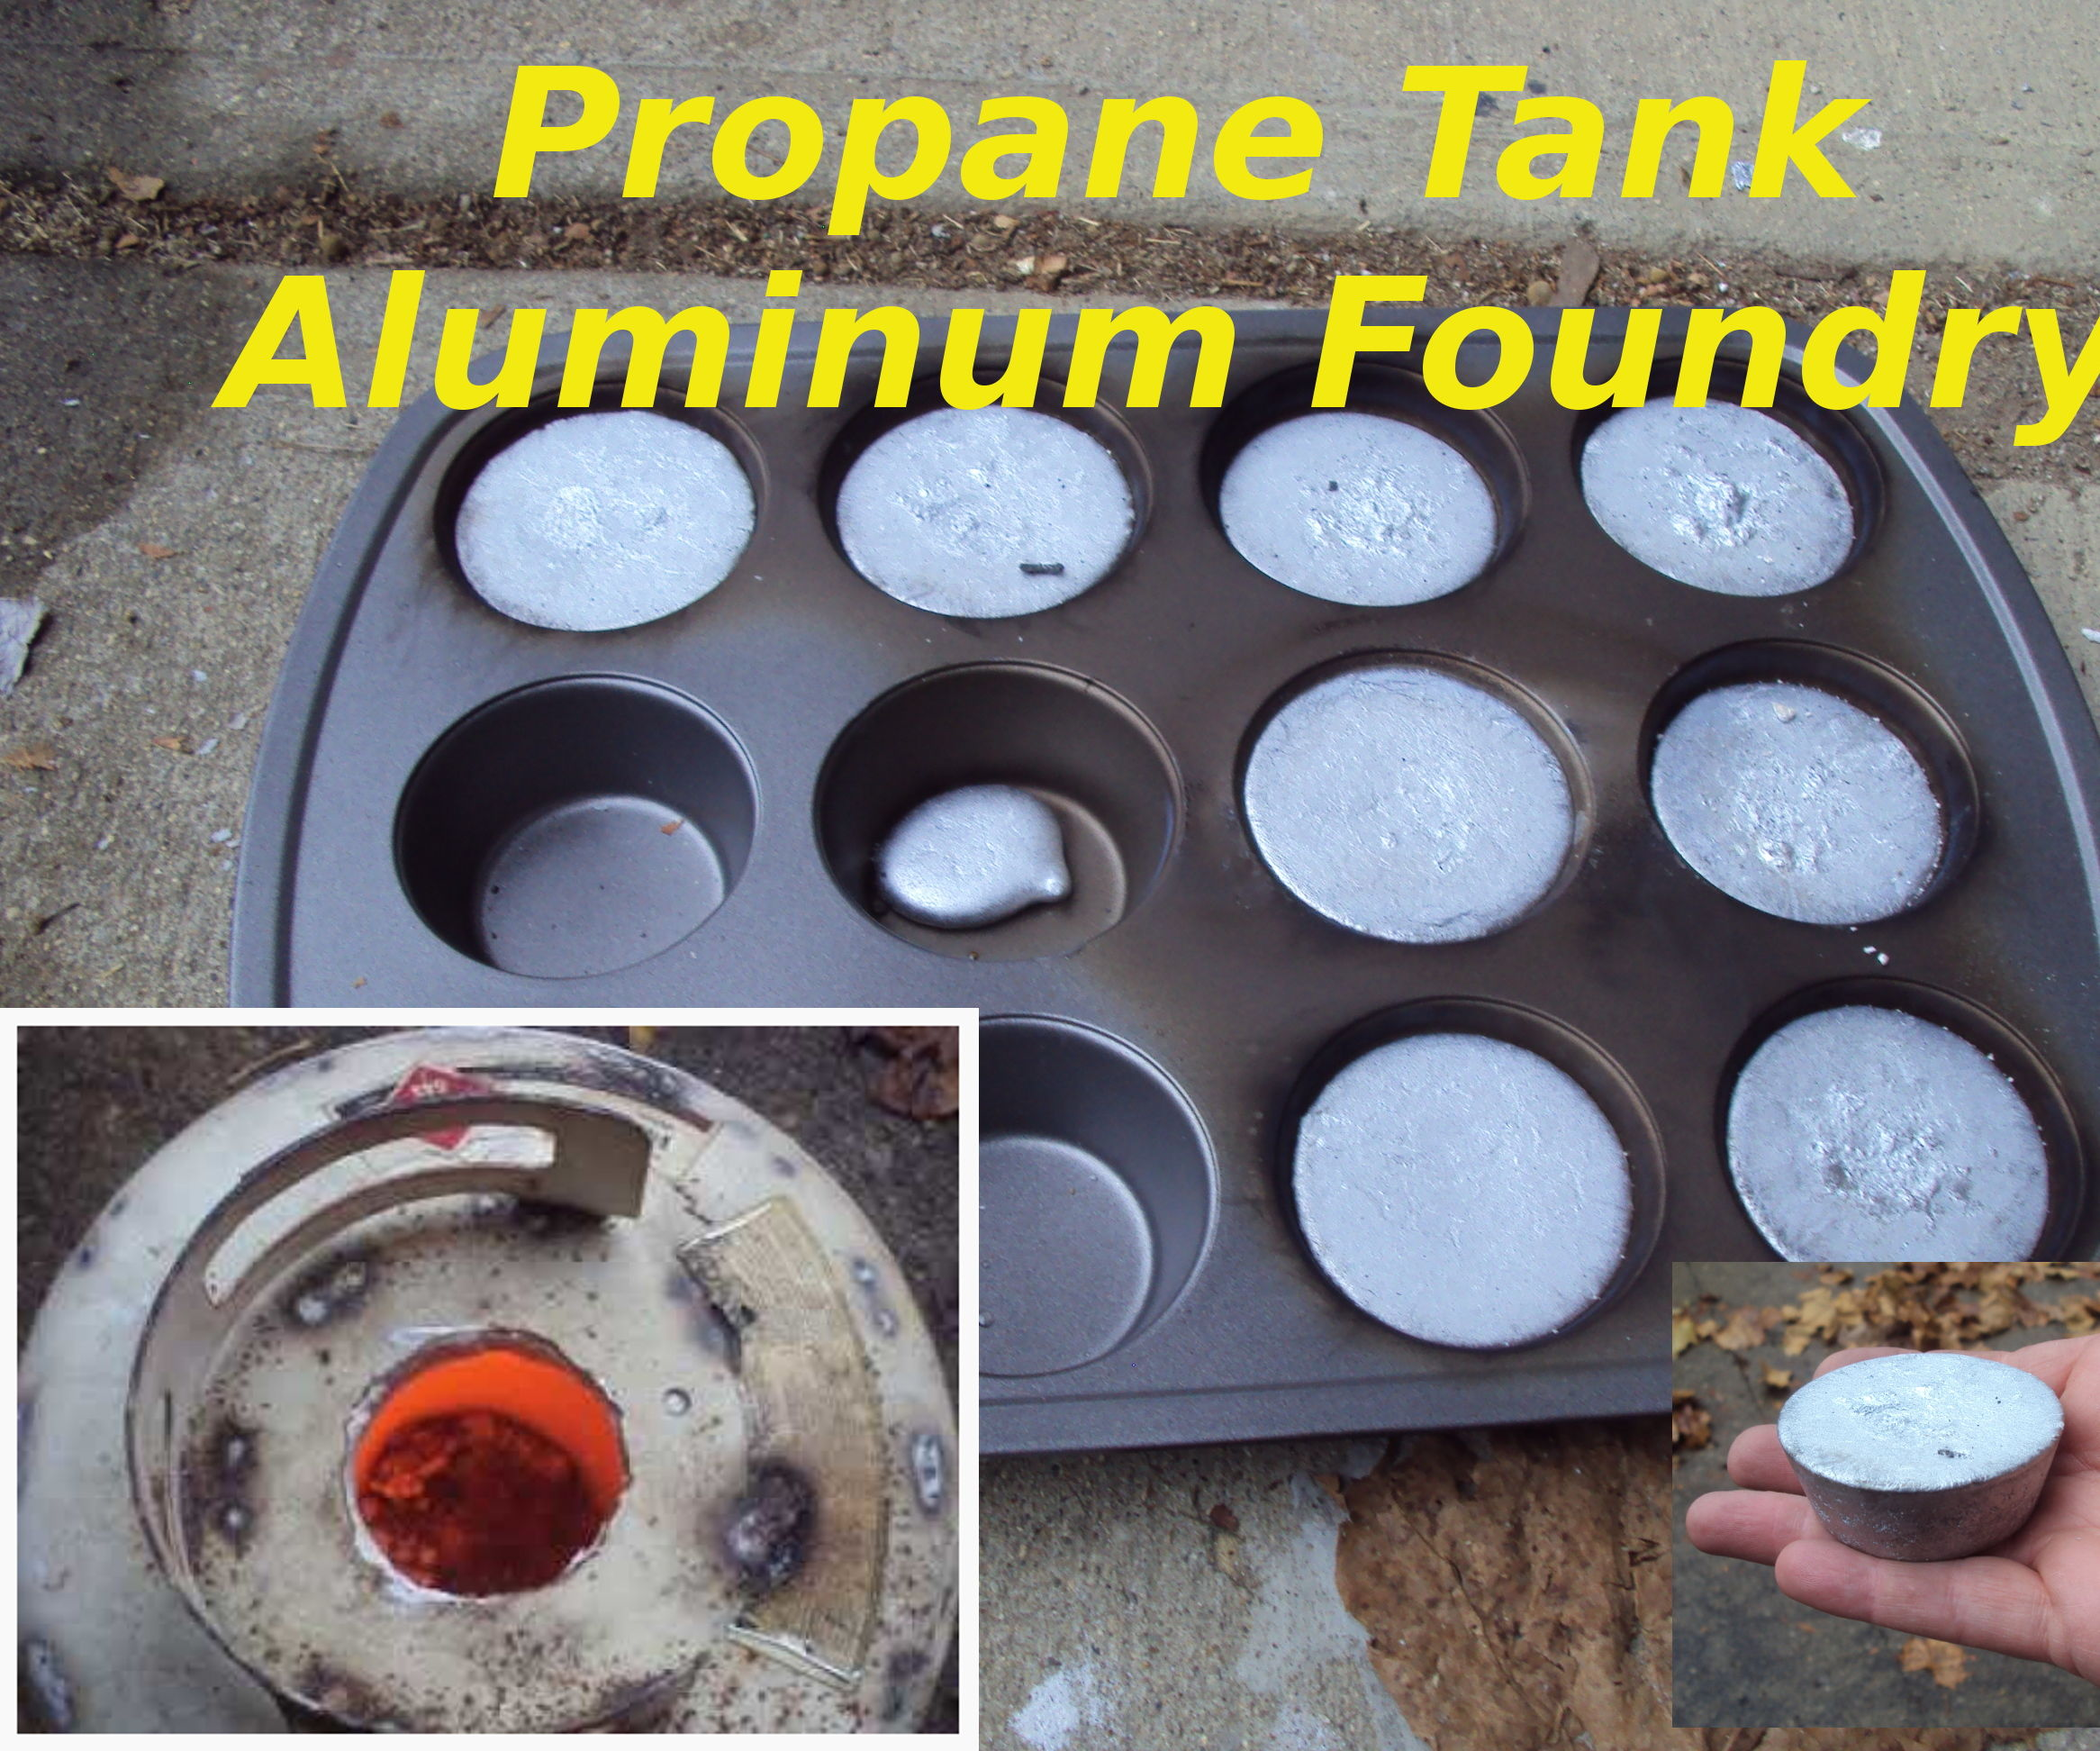 Aluminum Foundry